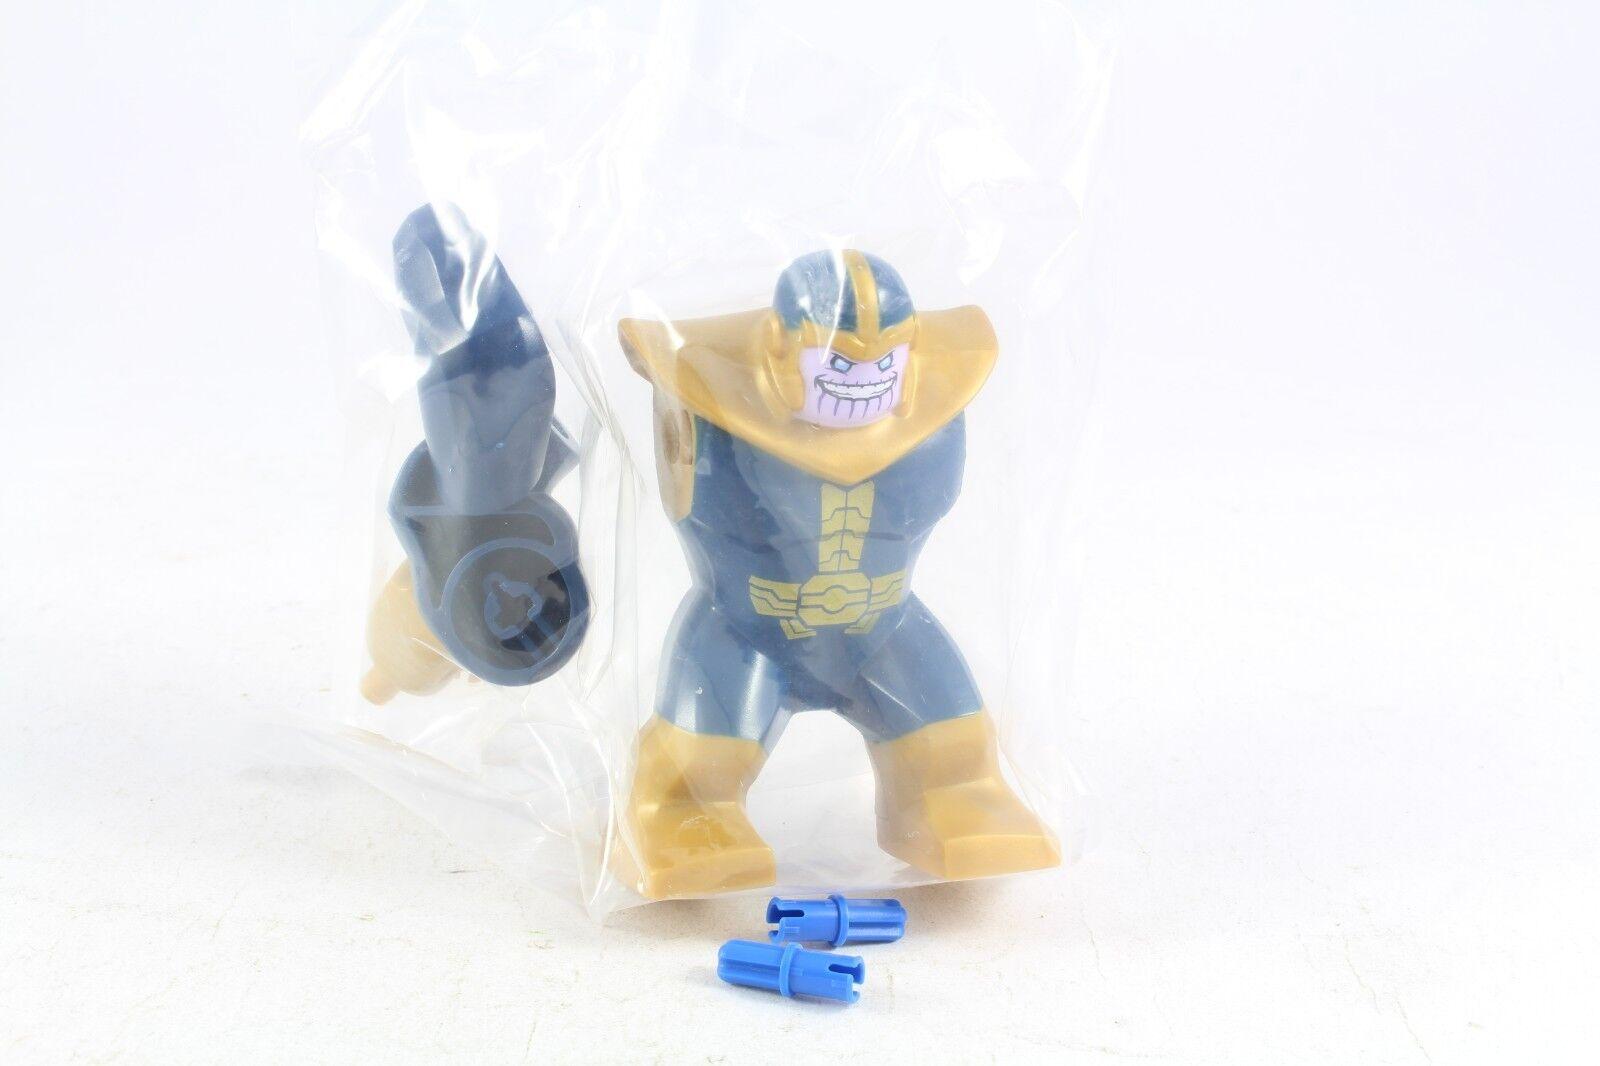 Lego Lego Lego Marvel Superheroes Thanos Minifigure Minifig Genuine Mint 76049 New c701a0